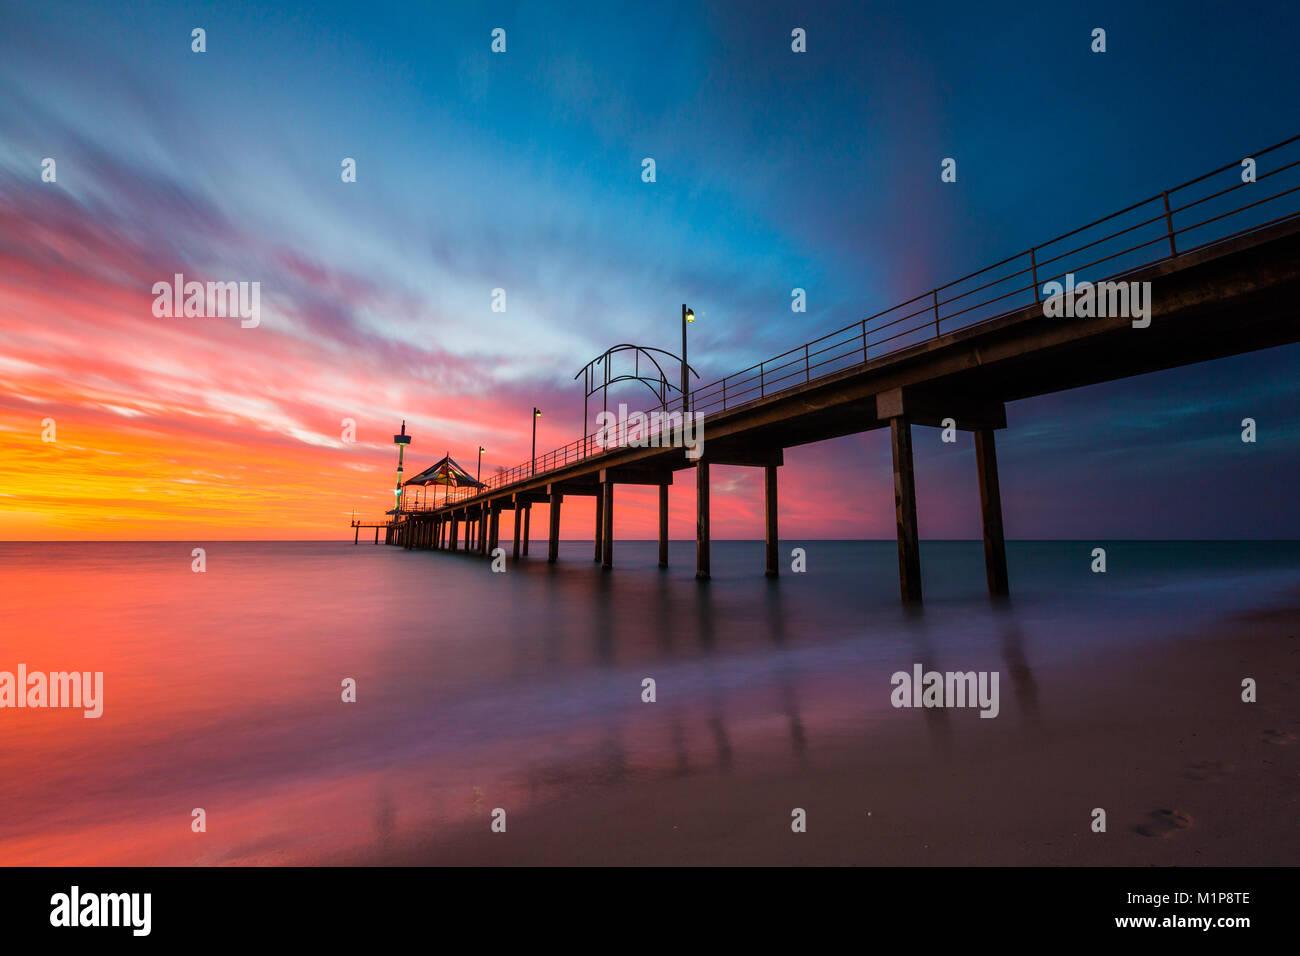 Eine lebendige Sonnenuntergang am Brighton Pier in Brighton, Adelaide, South Australia, Australien am 1. Februar Stockfoto